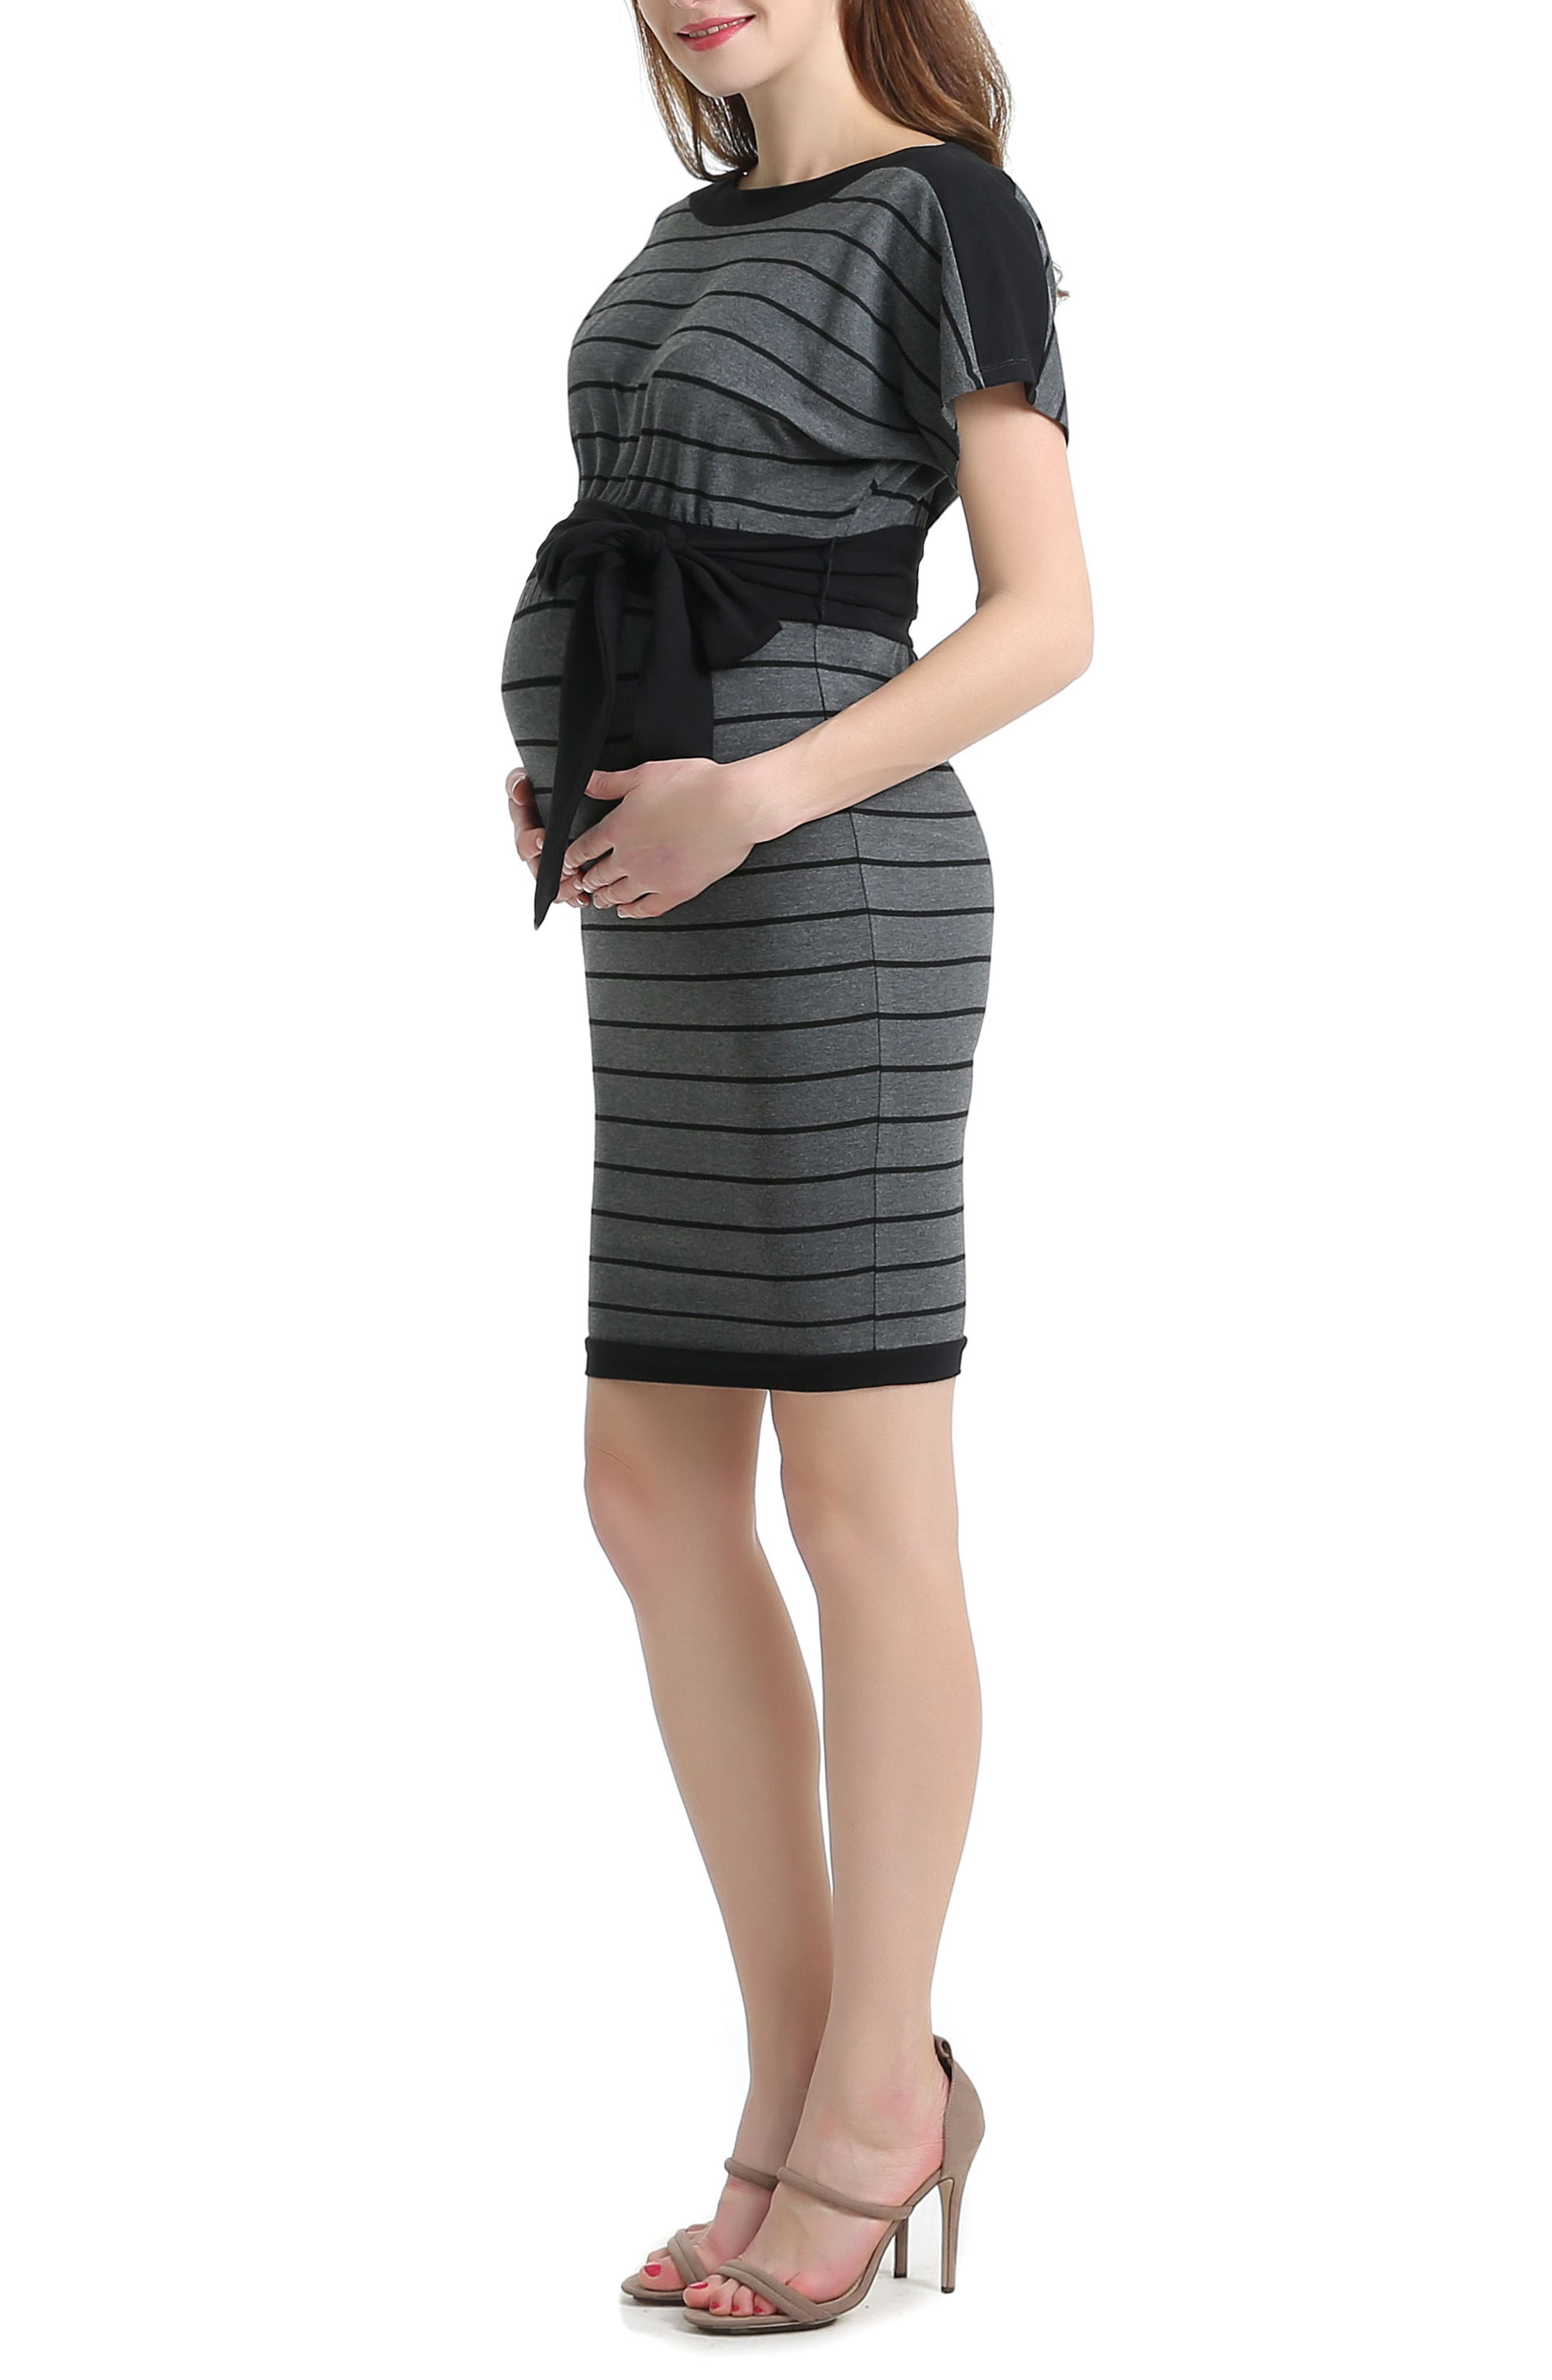 Anna Stretch Maternity Dress,                             Alternate thumbnail 4, color,                             Black/ Gray